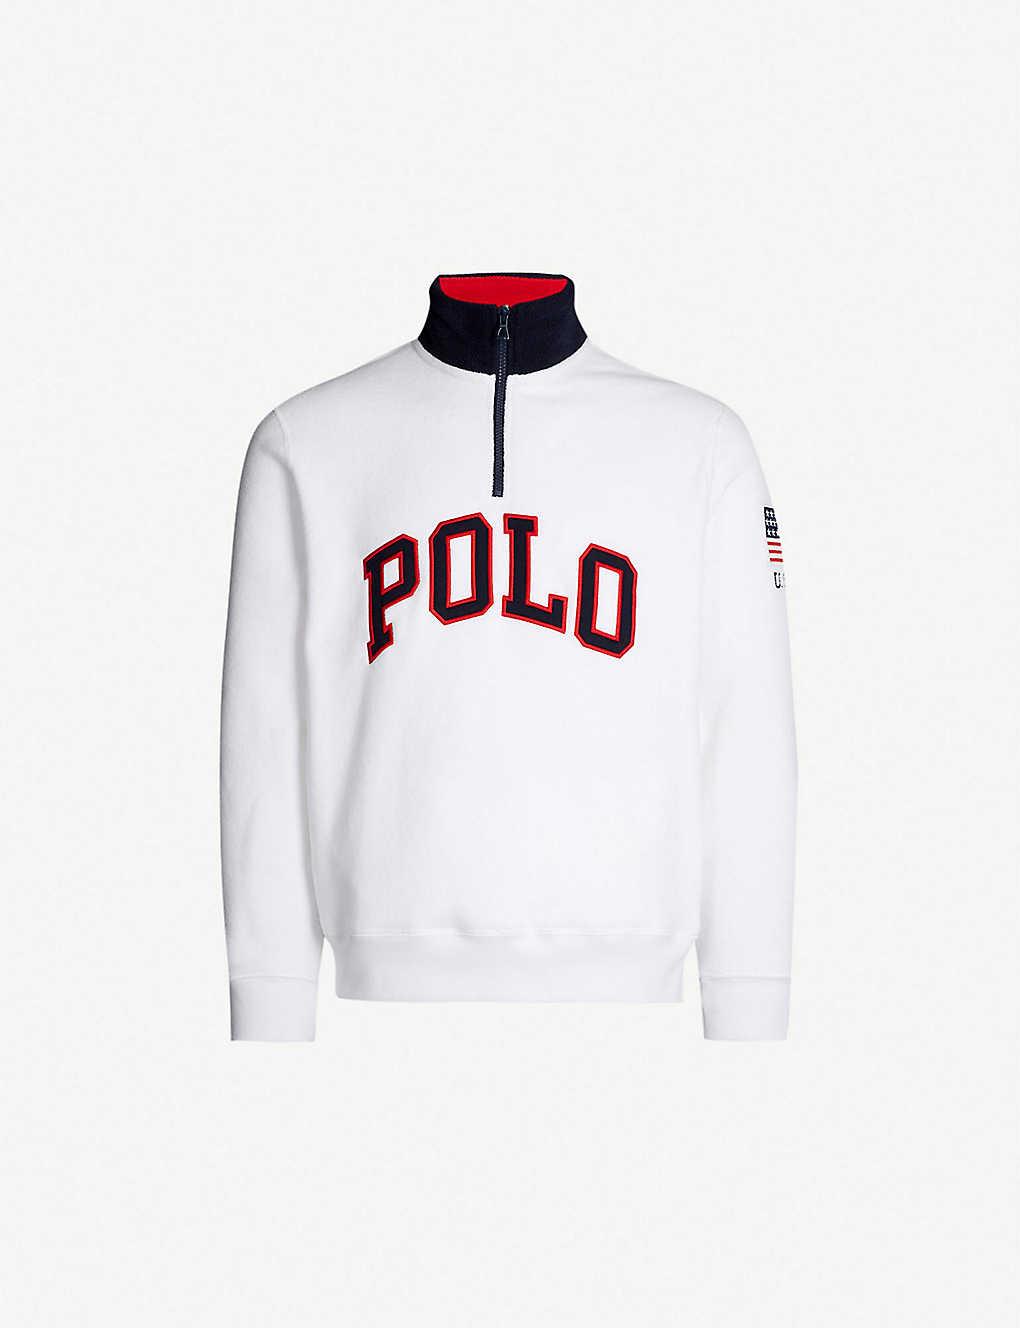 99b7307b POLO RALPH LAUREN - Logo-appliqu? fleece sweatshirt | Selfridges.com